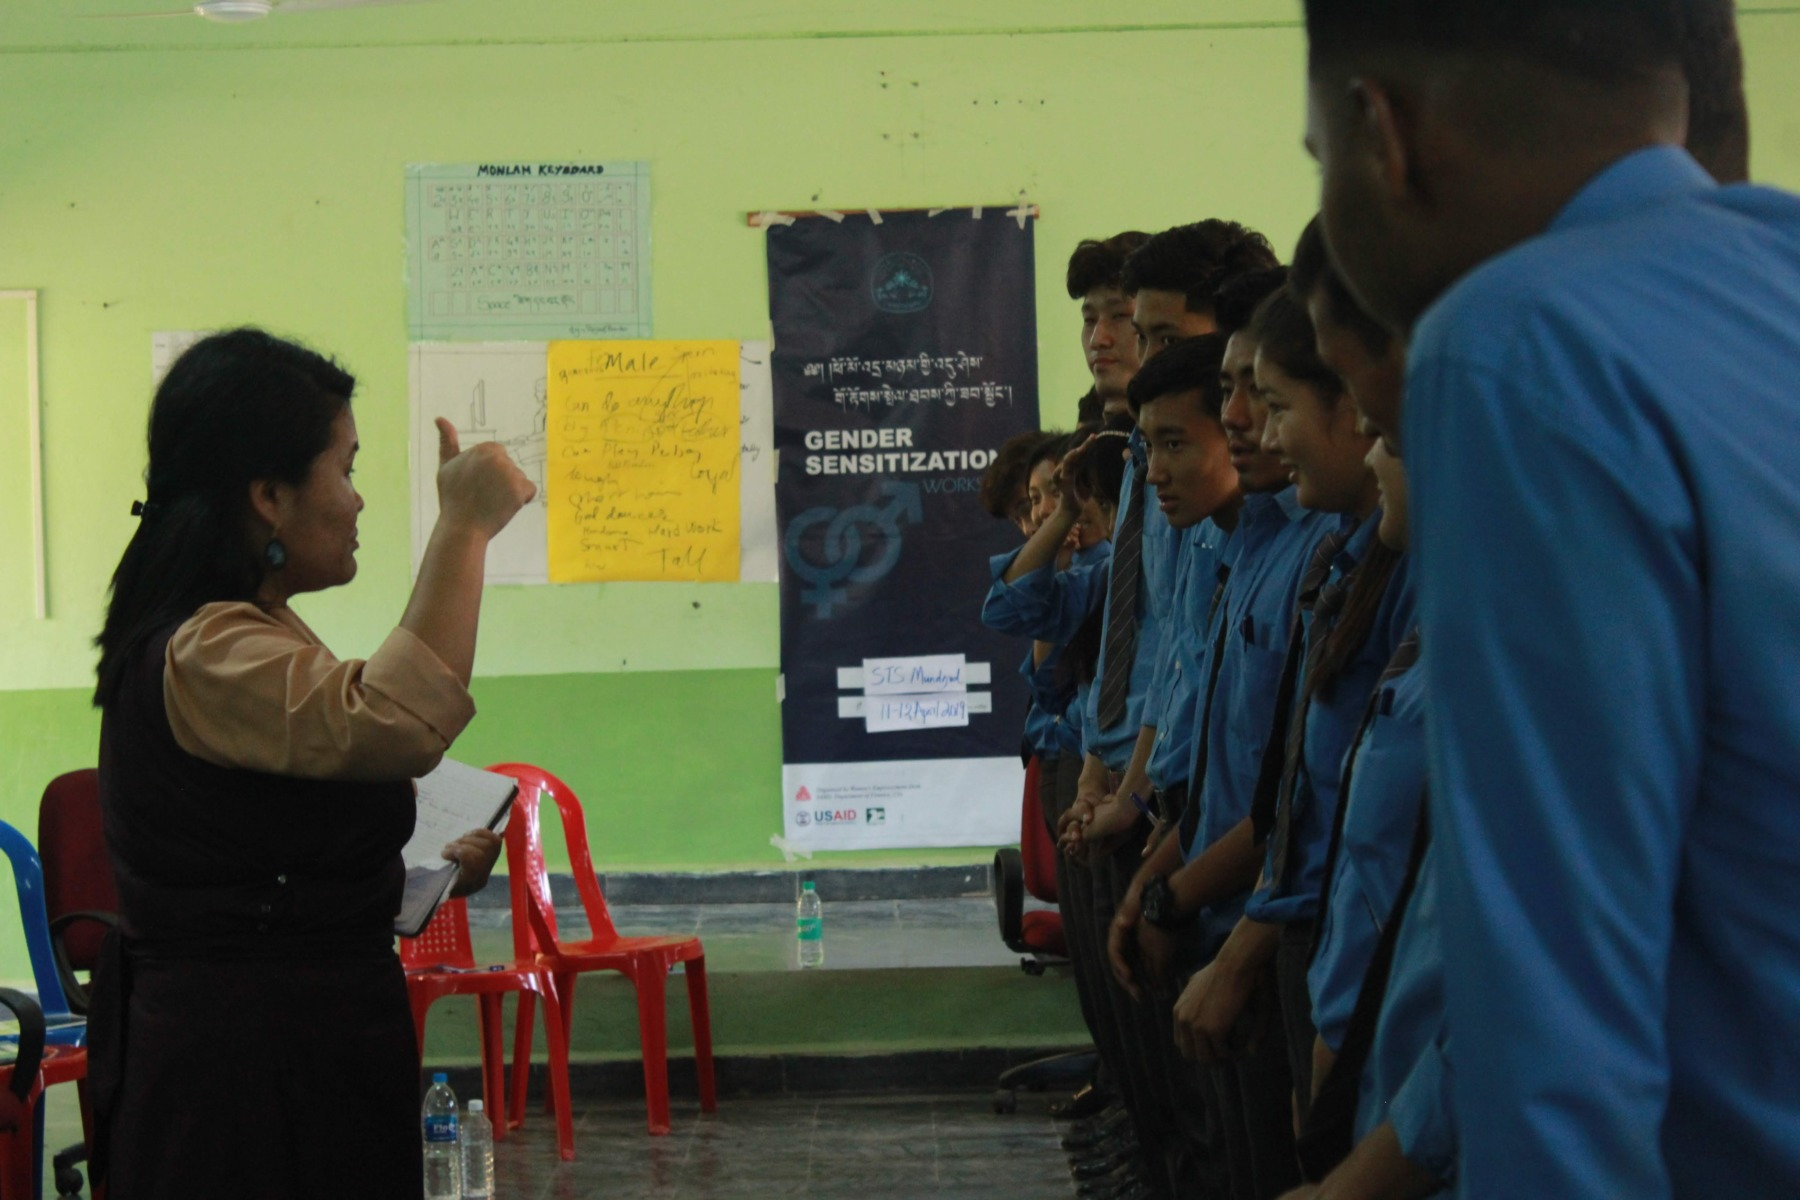 Gender Sensitization Workshop in progress. A woman teaching a class of teenage boys. The poster in the background reads 'Gender Sensitization'.